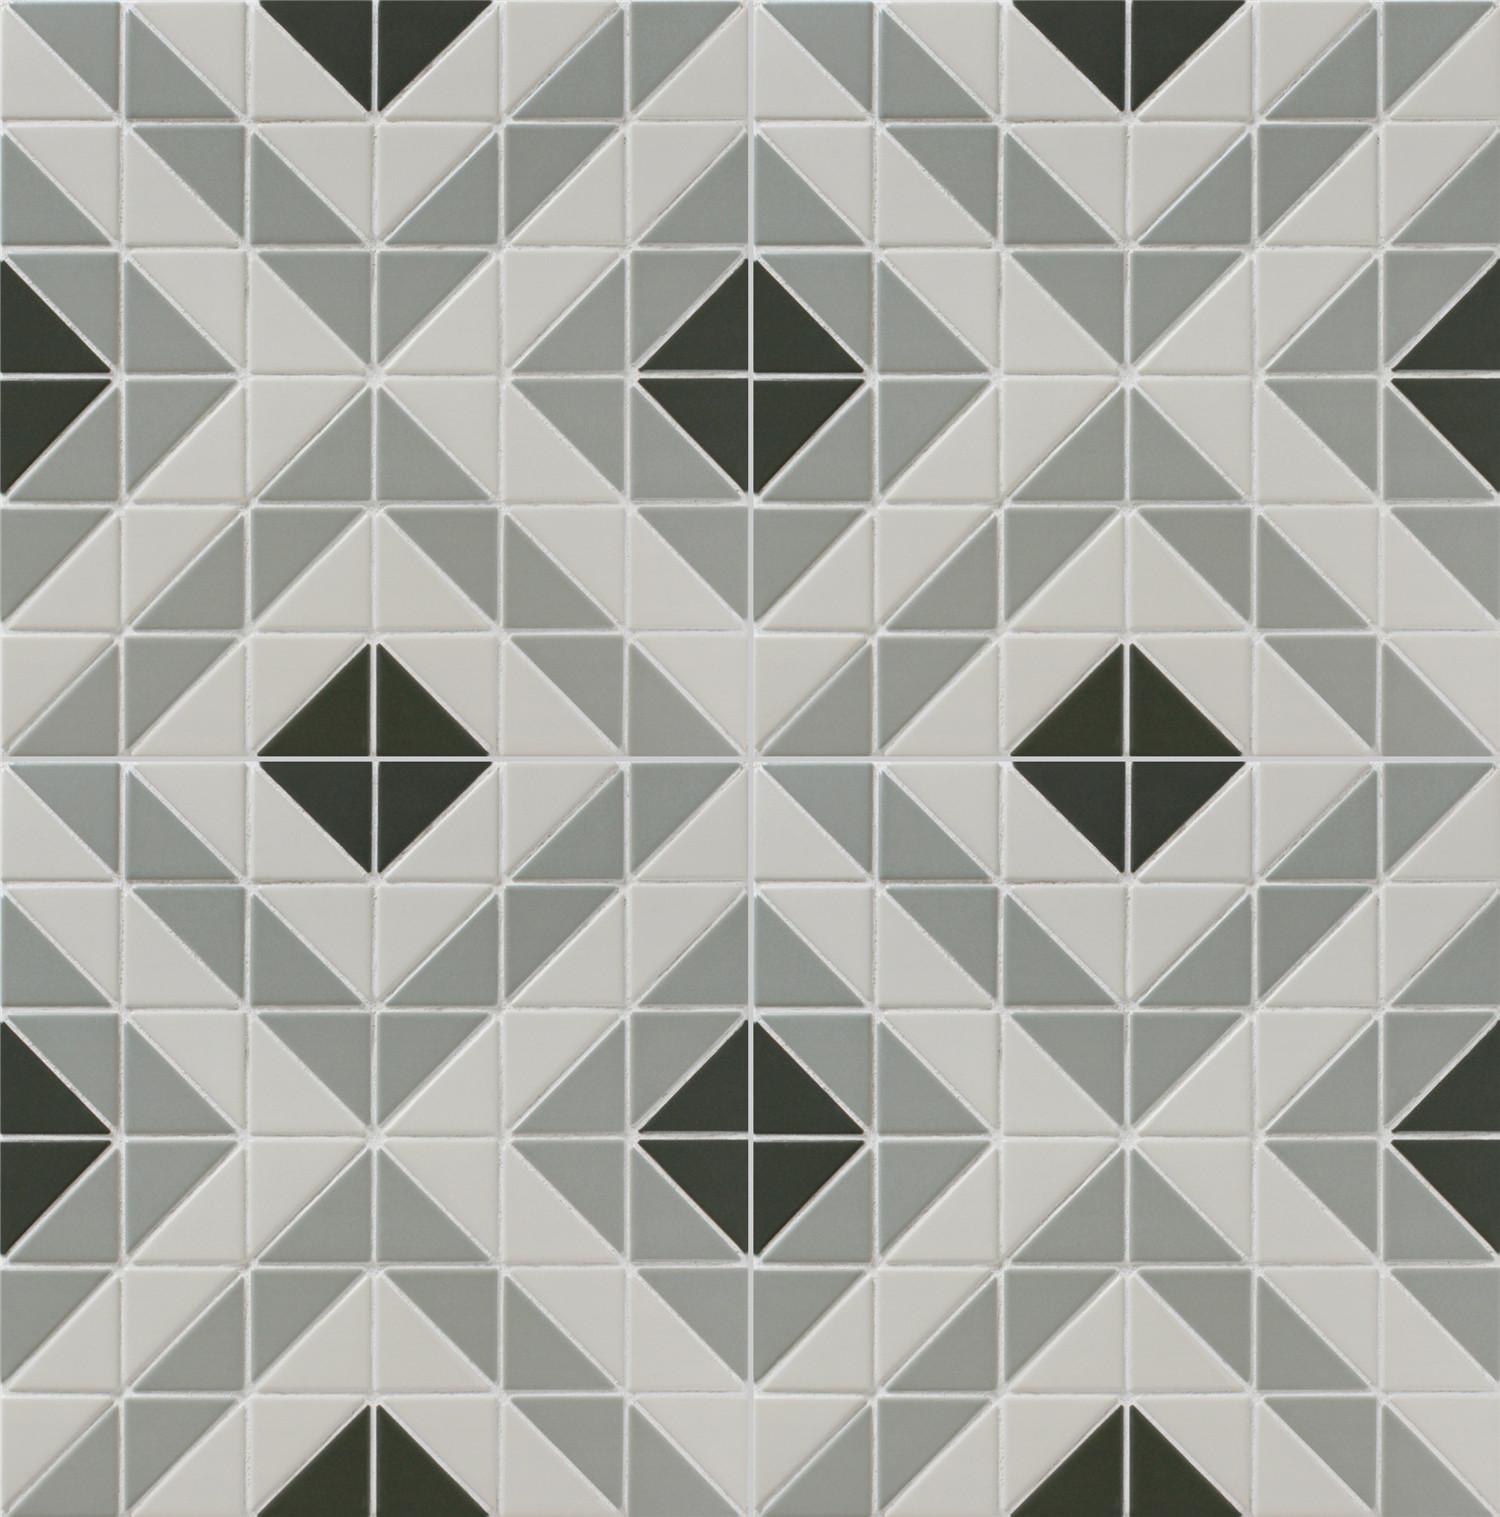 Chino Hill Square 2 Triangle Geometric Tiles Art